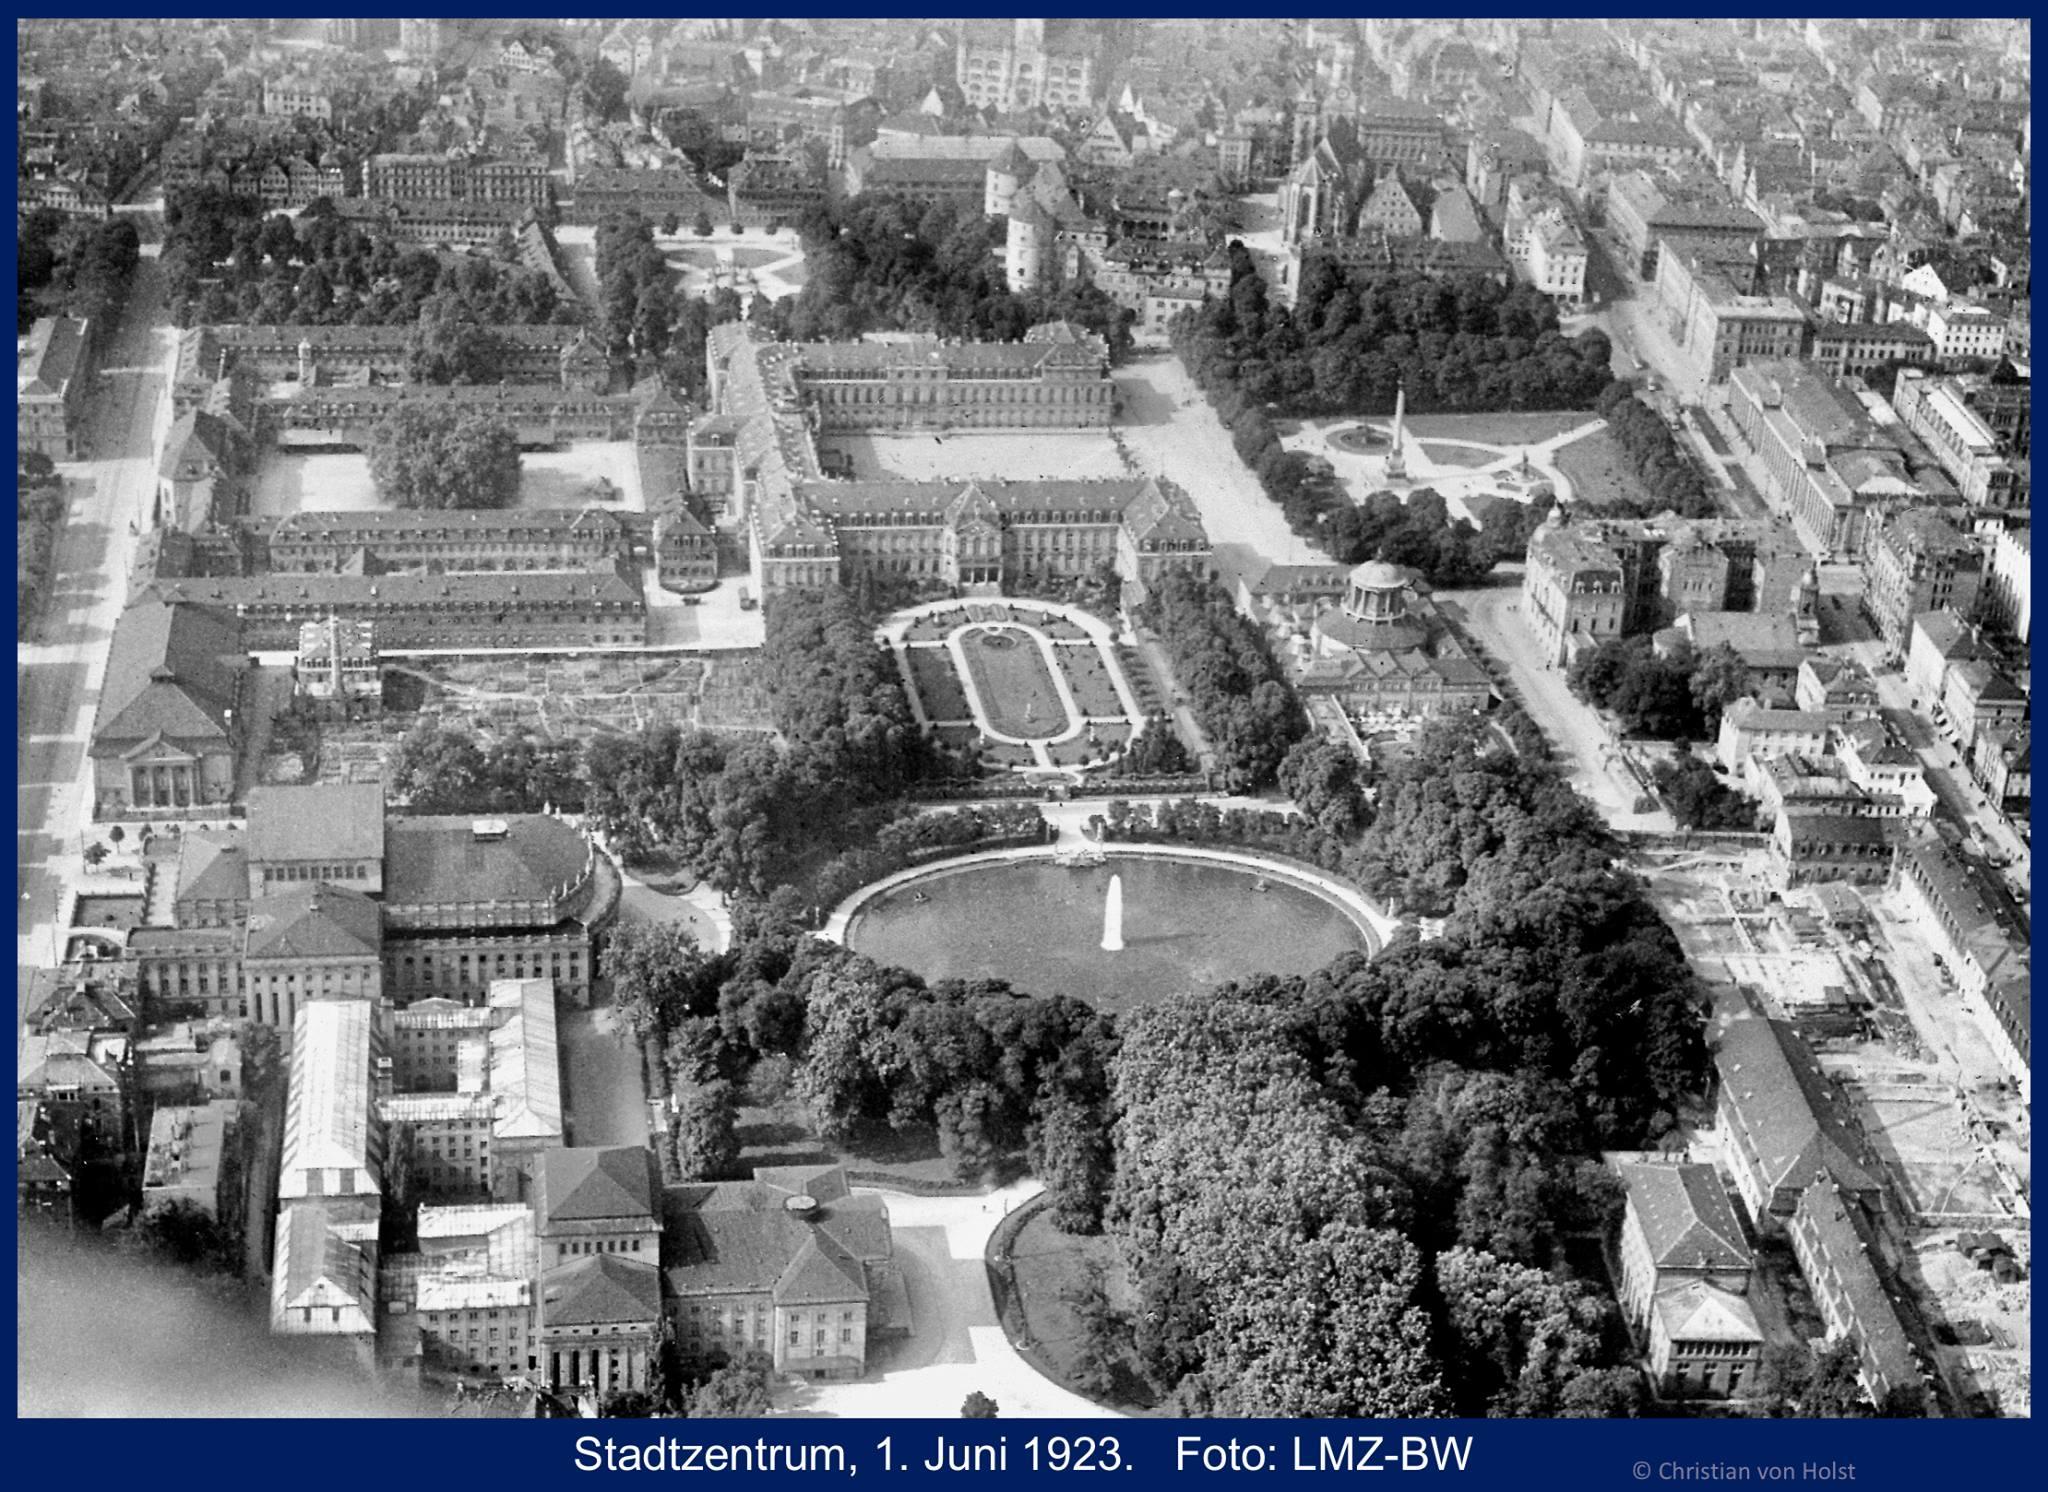 Ovalsee: Nikolaus Thouret, 1850-1941 – Luftbild 1923 Thourets Stadtstruktur complete erhalten